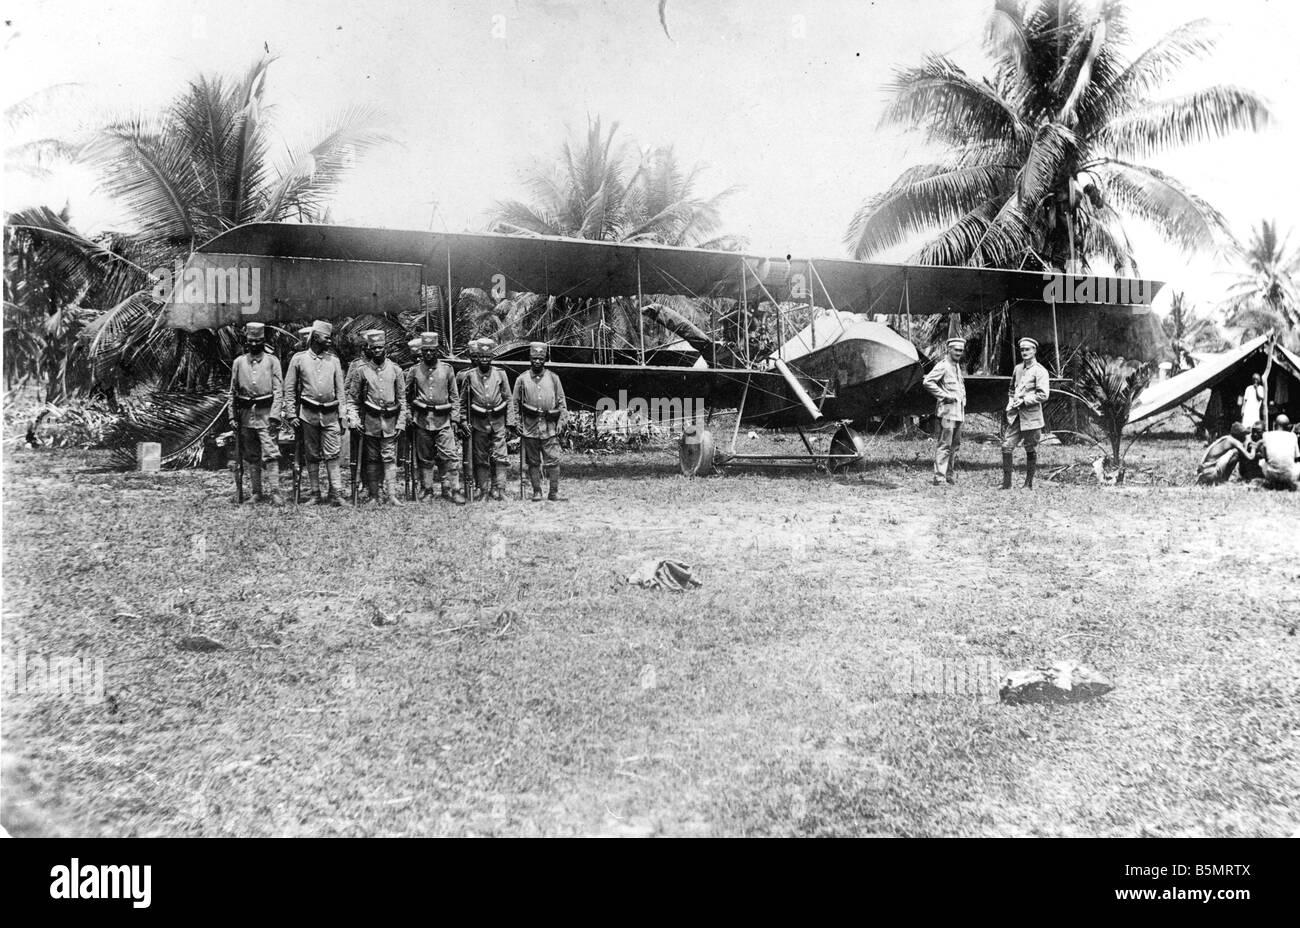 9AF 1914 0 0 A5 1 Askaris in aereo Ger East Africa Guerra Mondiale 1 guerra nelle colonie tedesco East Africa Tanzania ora aux nativo Foto Stock